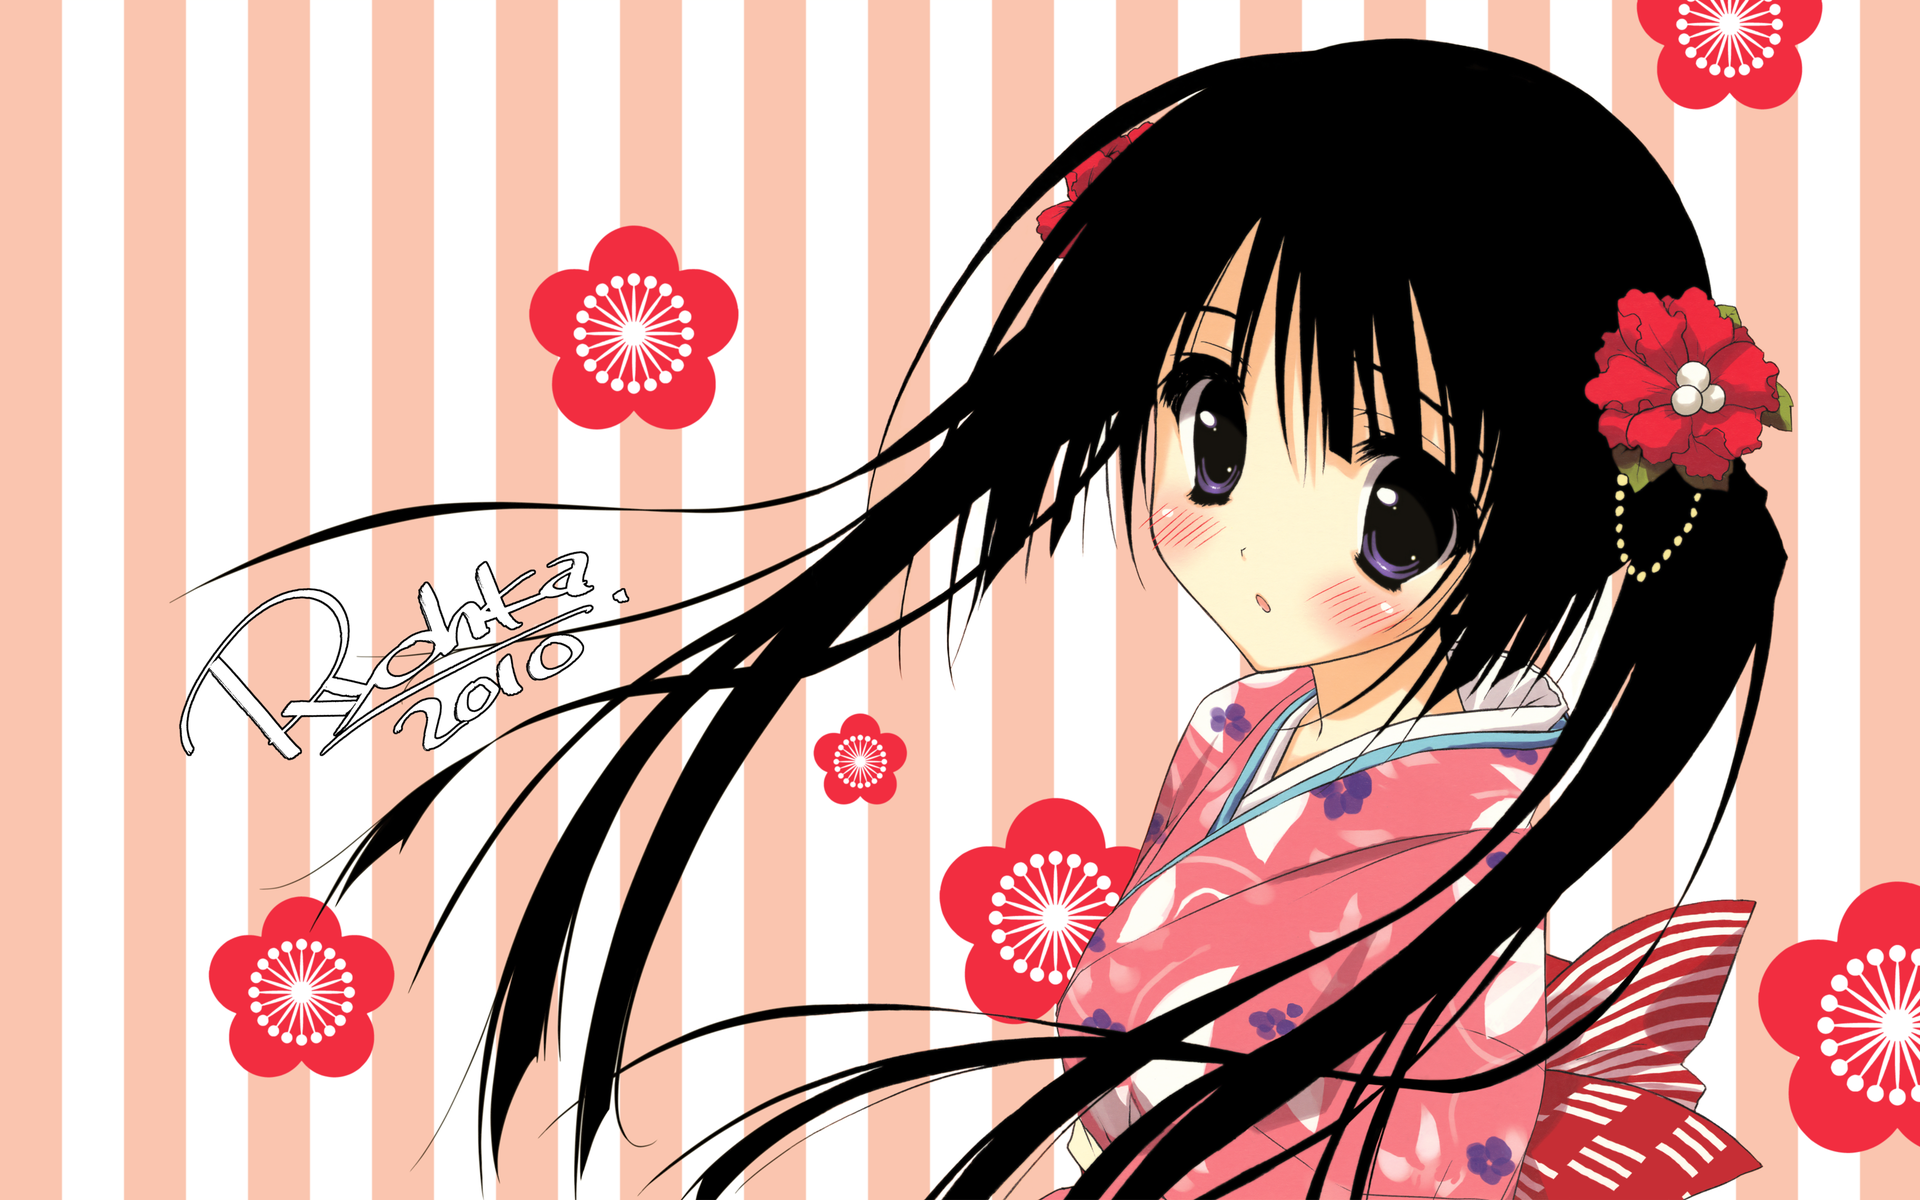 random cute girl wallpaper - photo #15